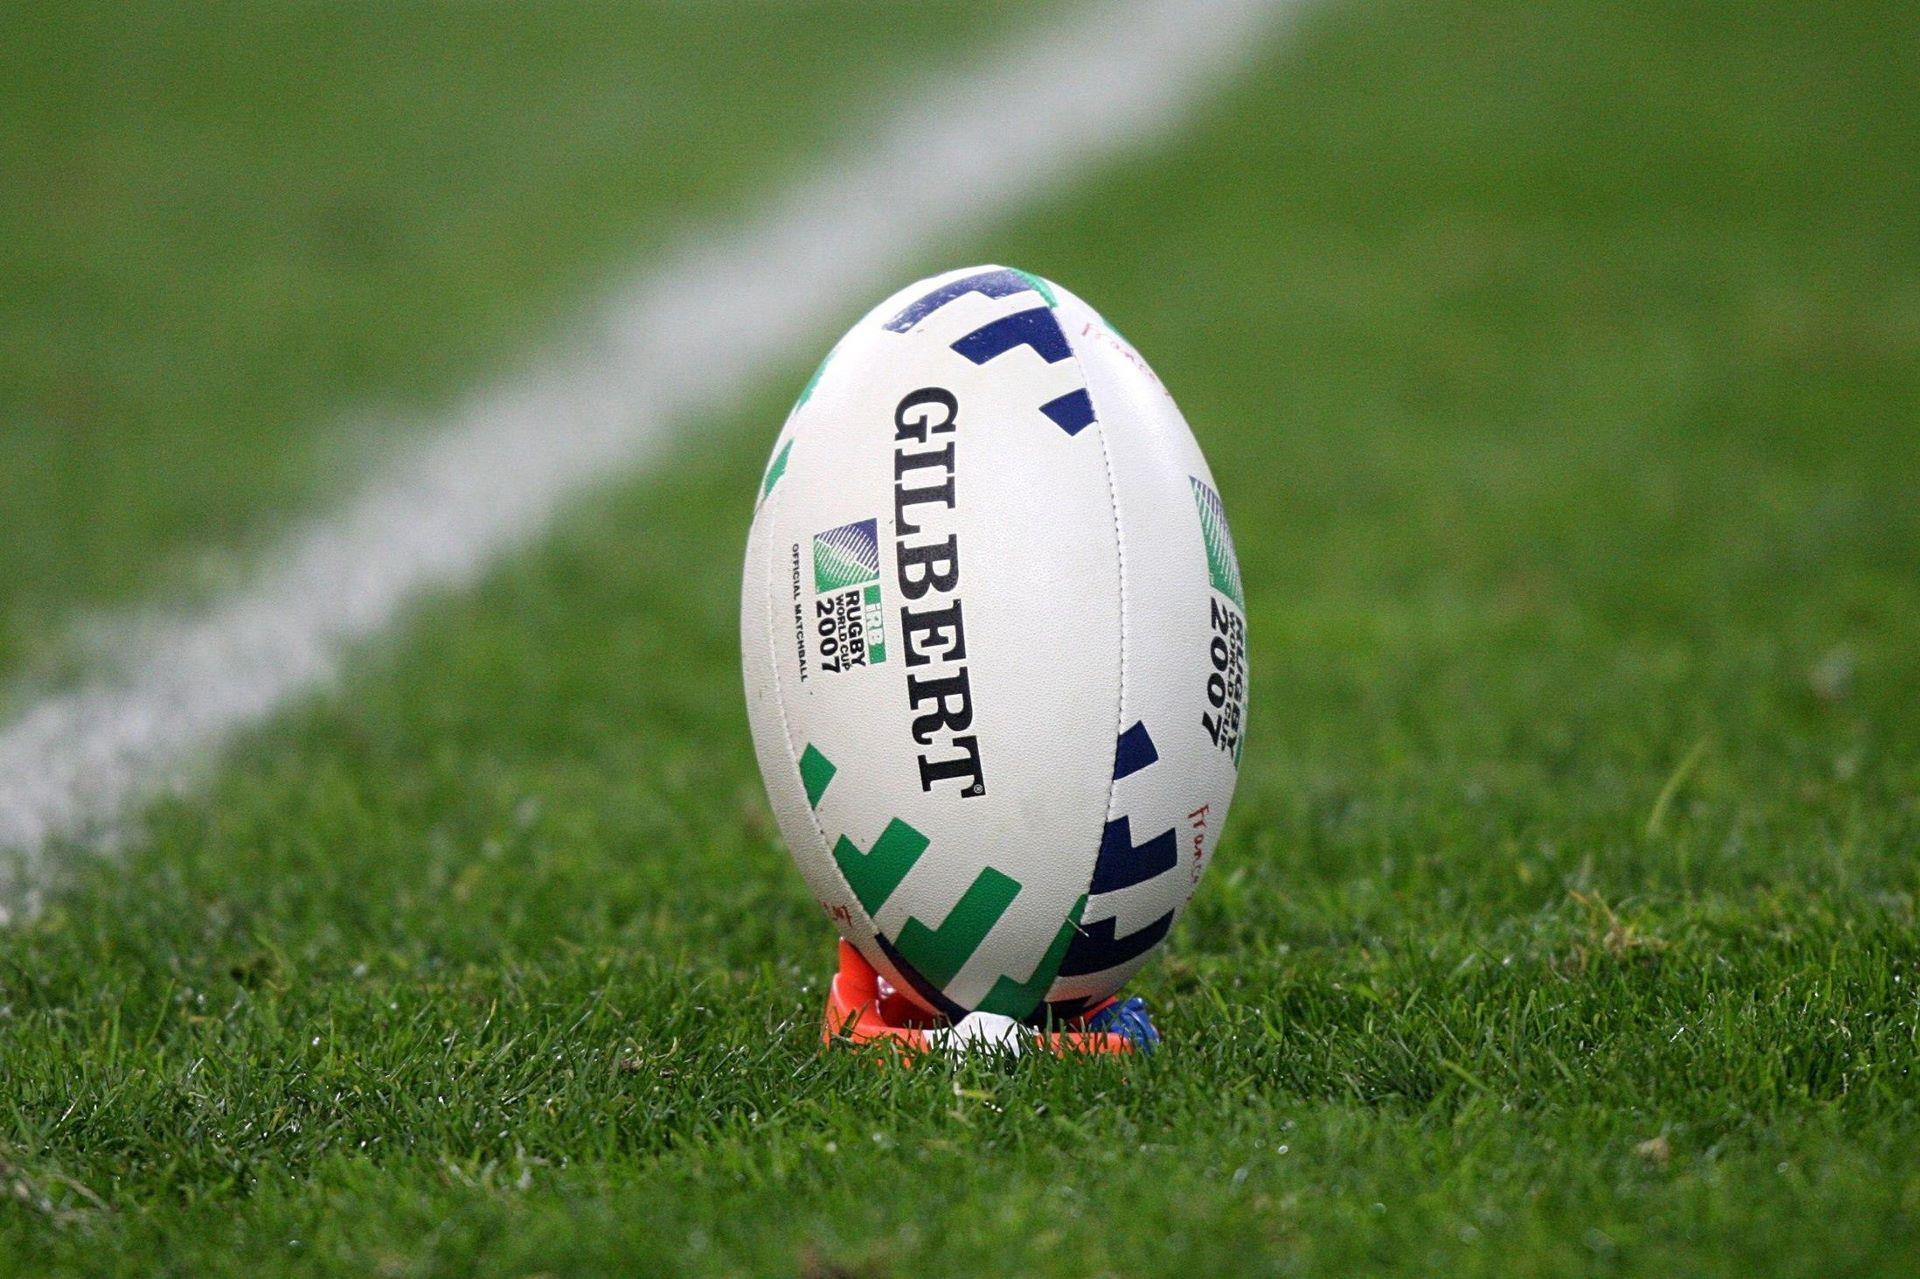 ballon-de-rugby_coupe-du-monde-a-londres_02